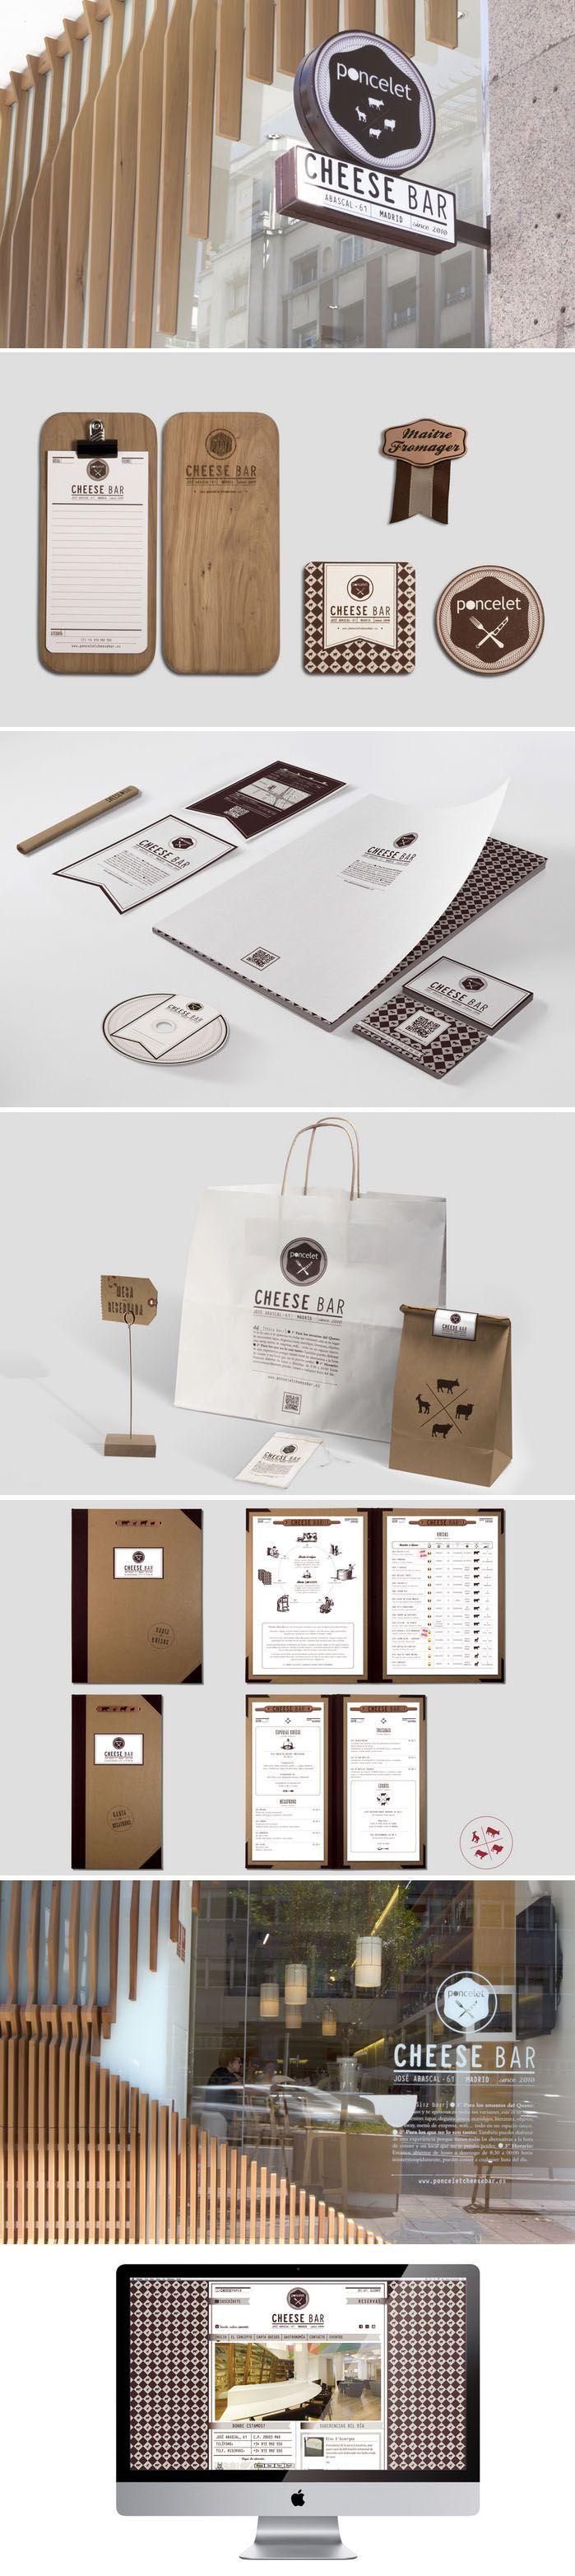 Unique Branding Design, Poncelet Cheese Bar #branding #design (http://www.pinterest.com/aldenchong/)